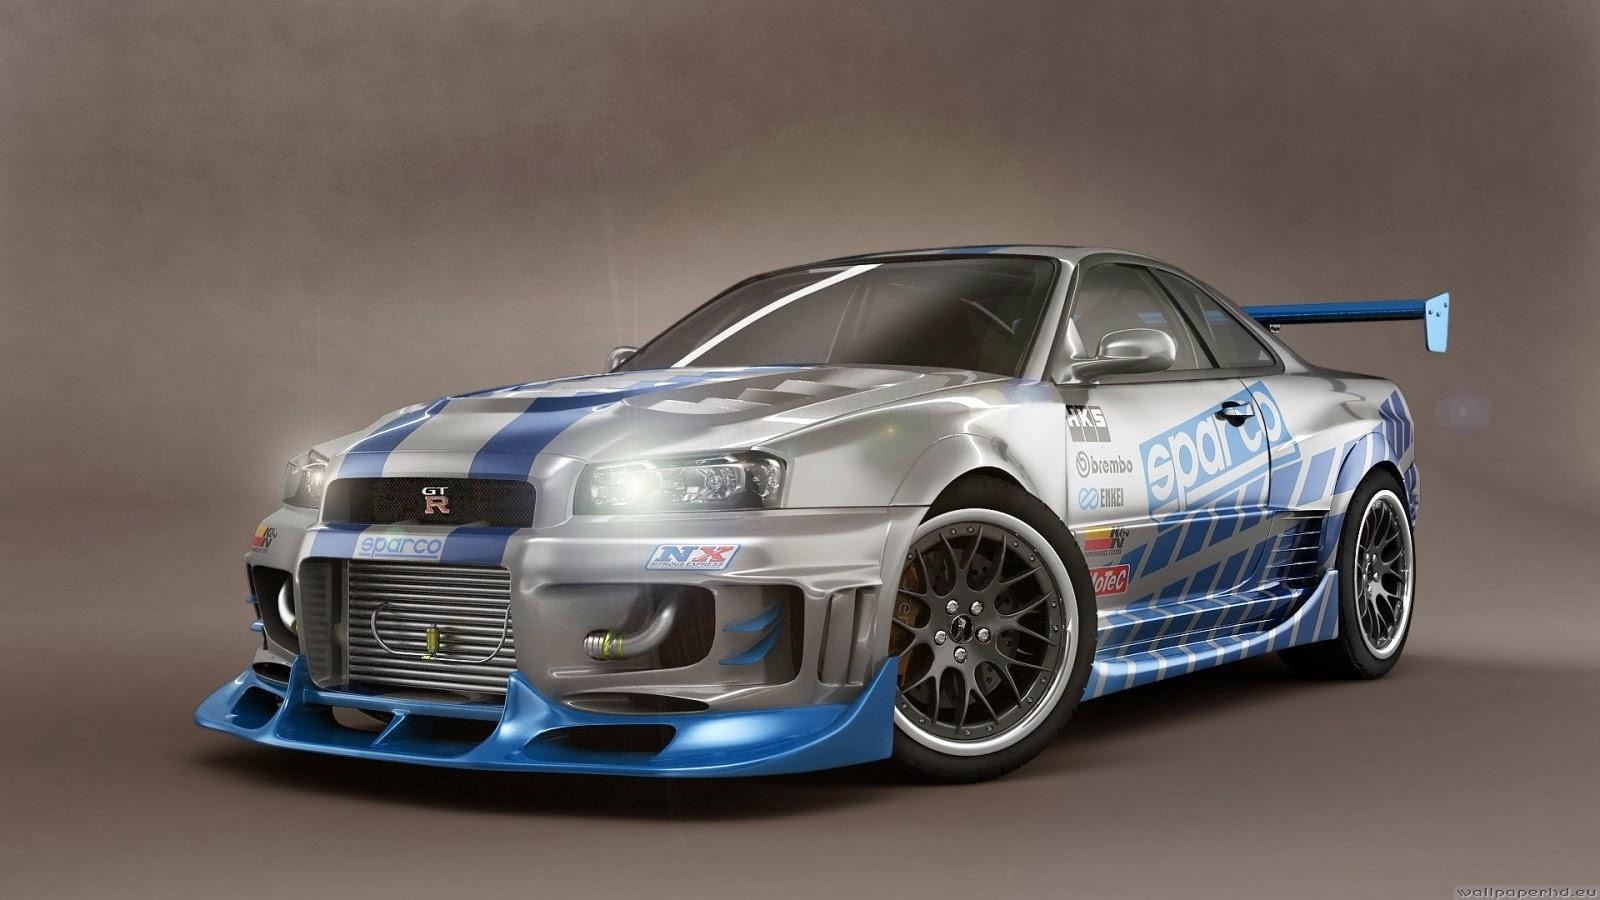 2014 Nissan Skyline GTR